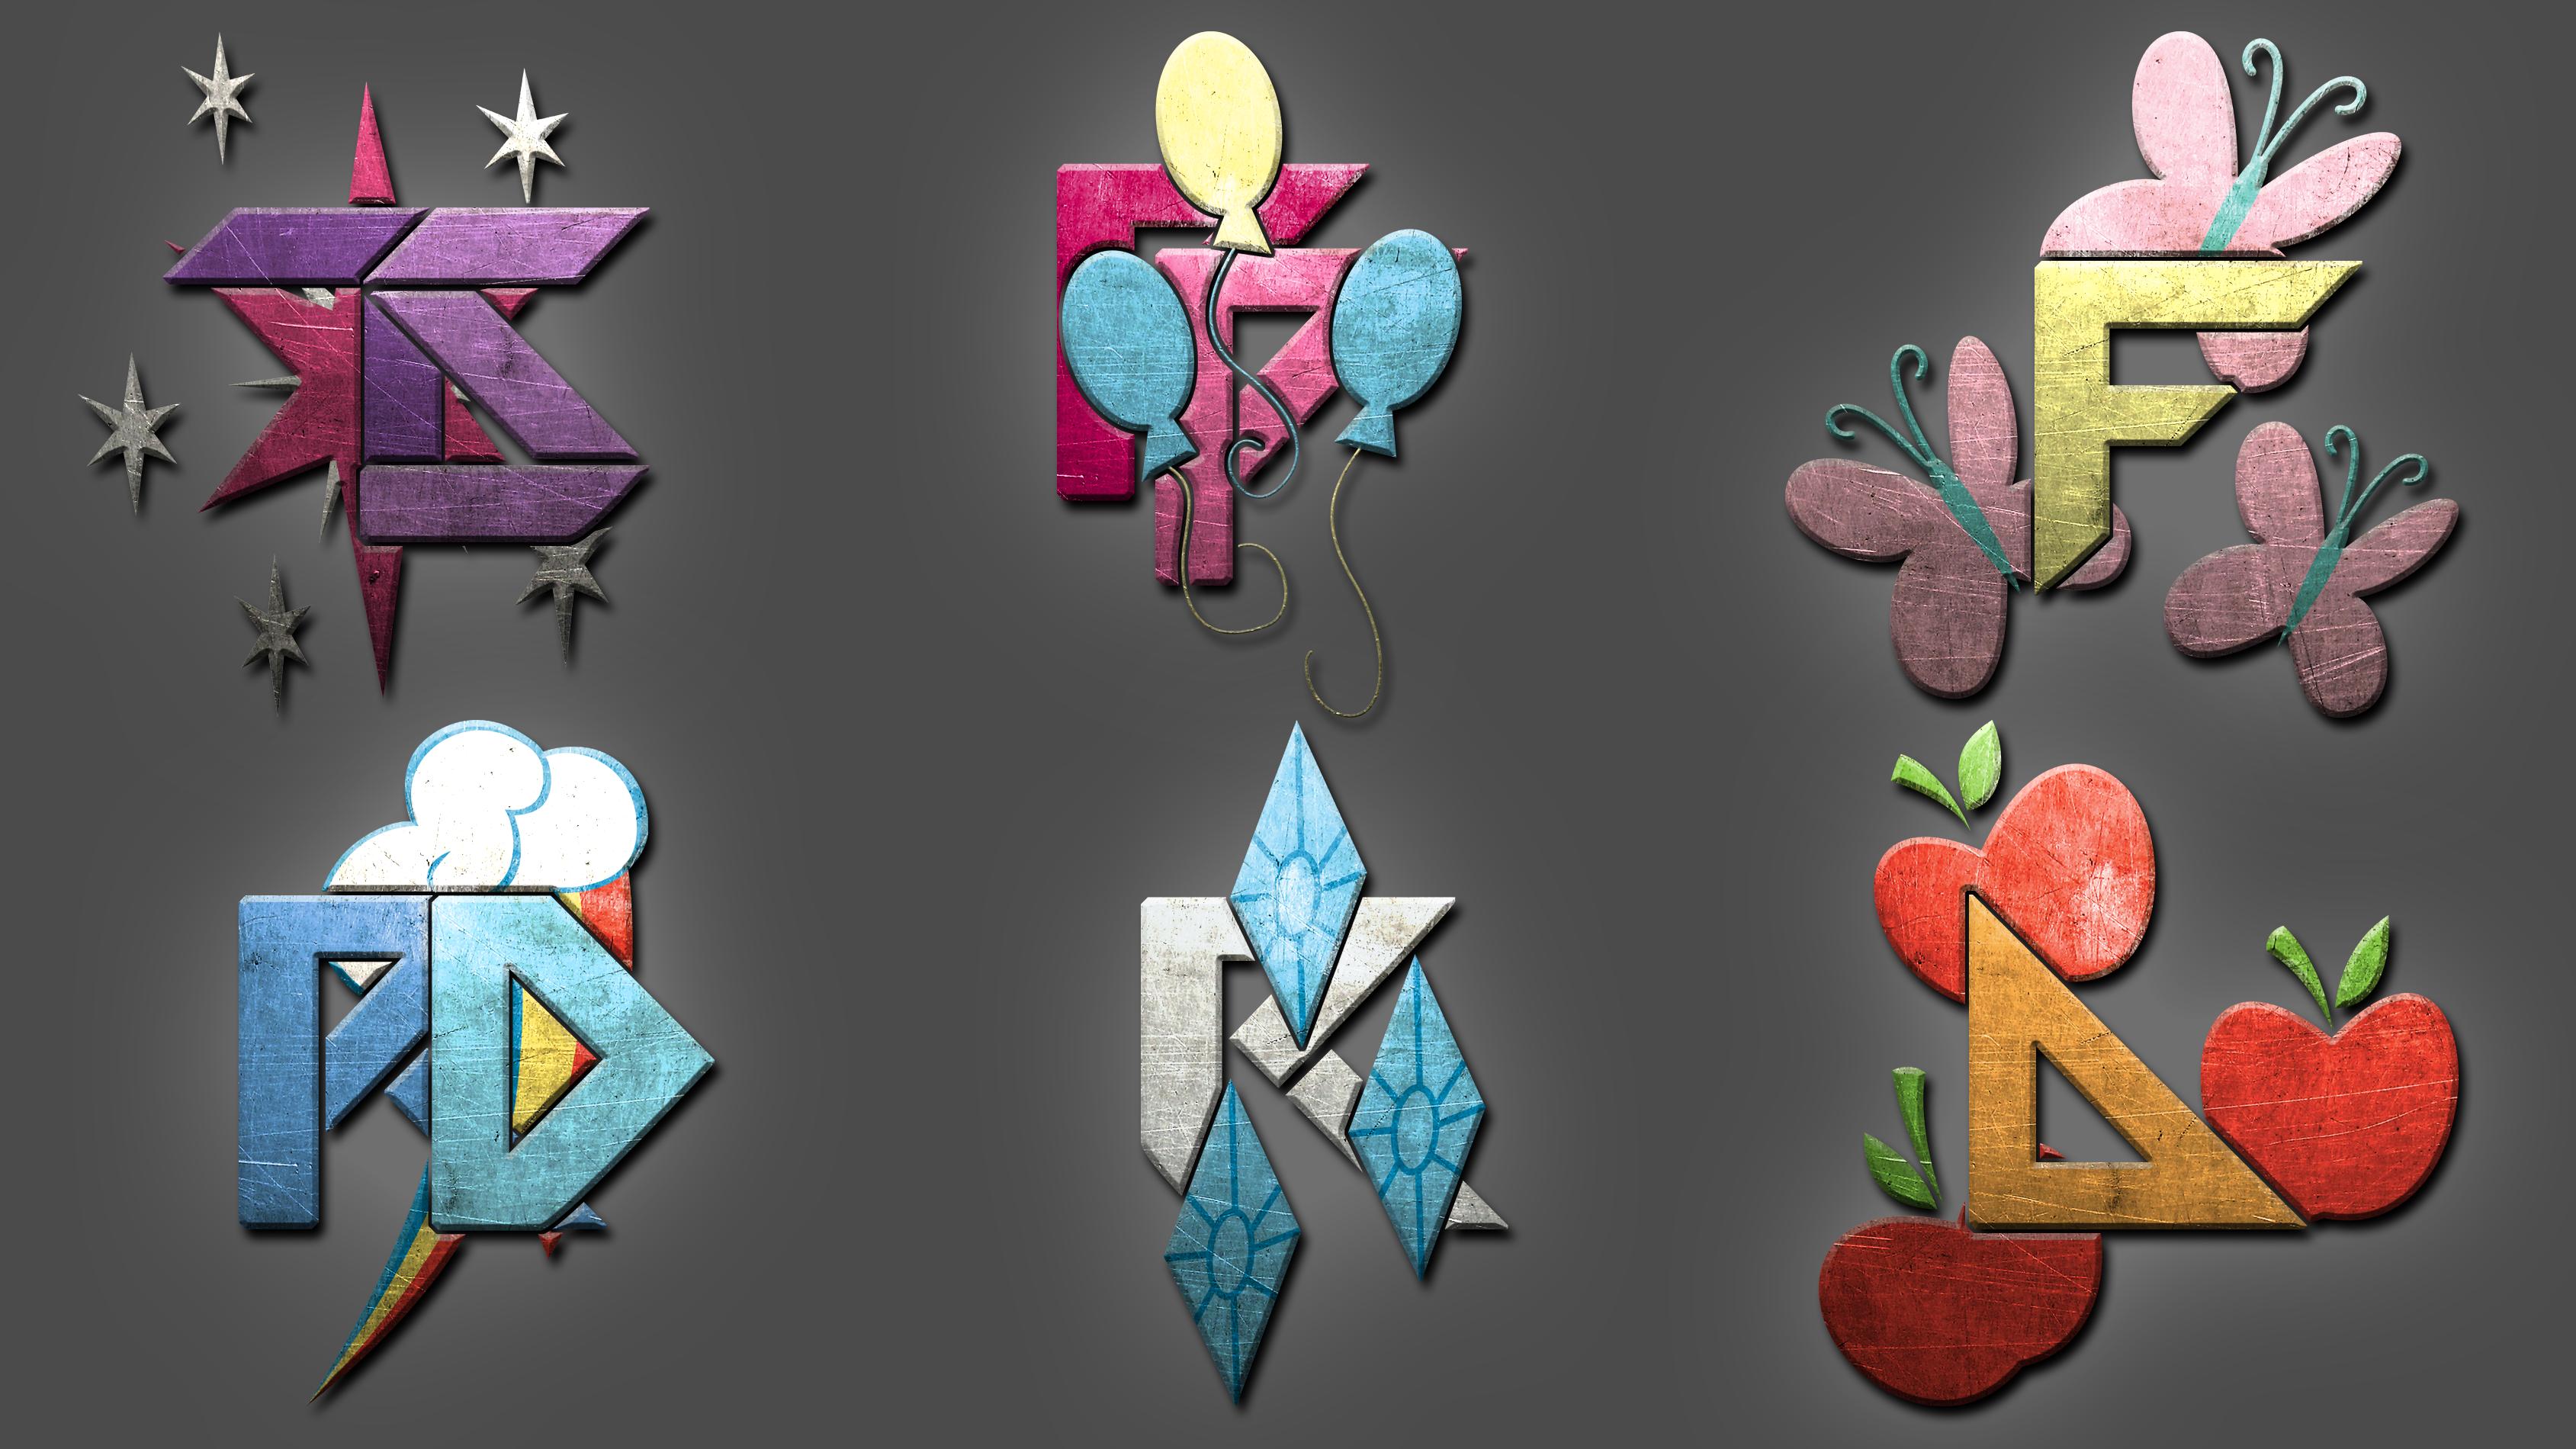 Mane6 - Logos by pims1978